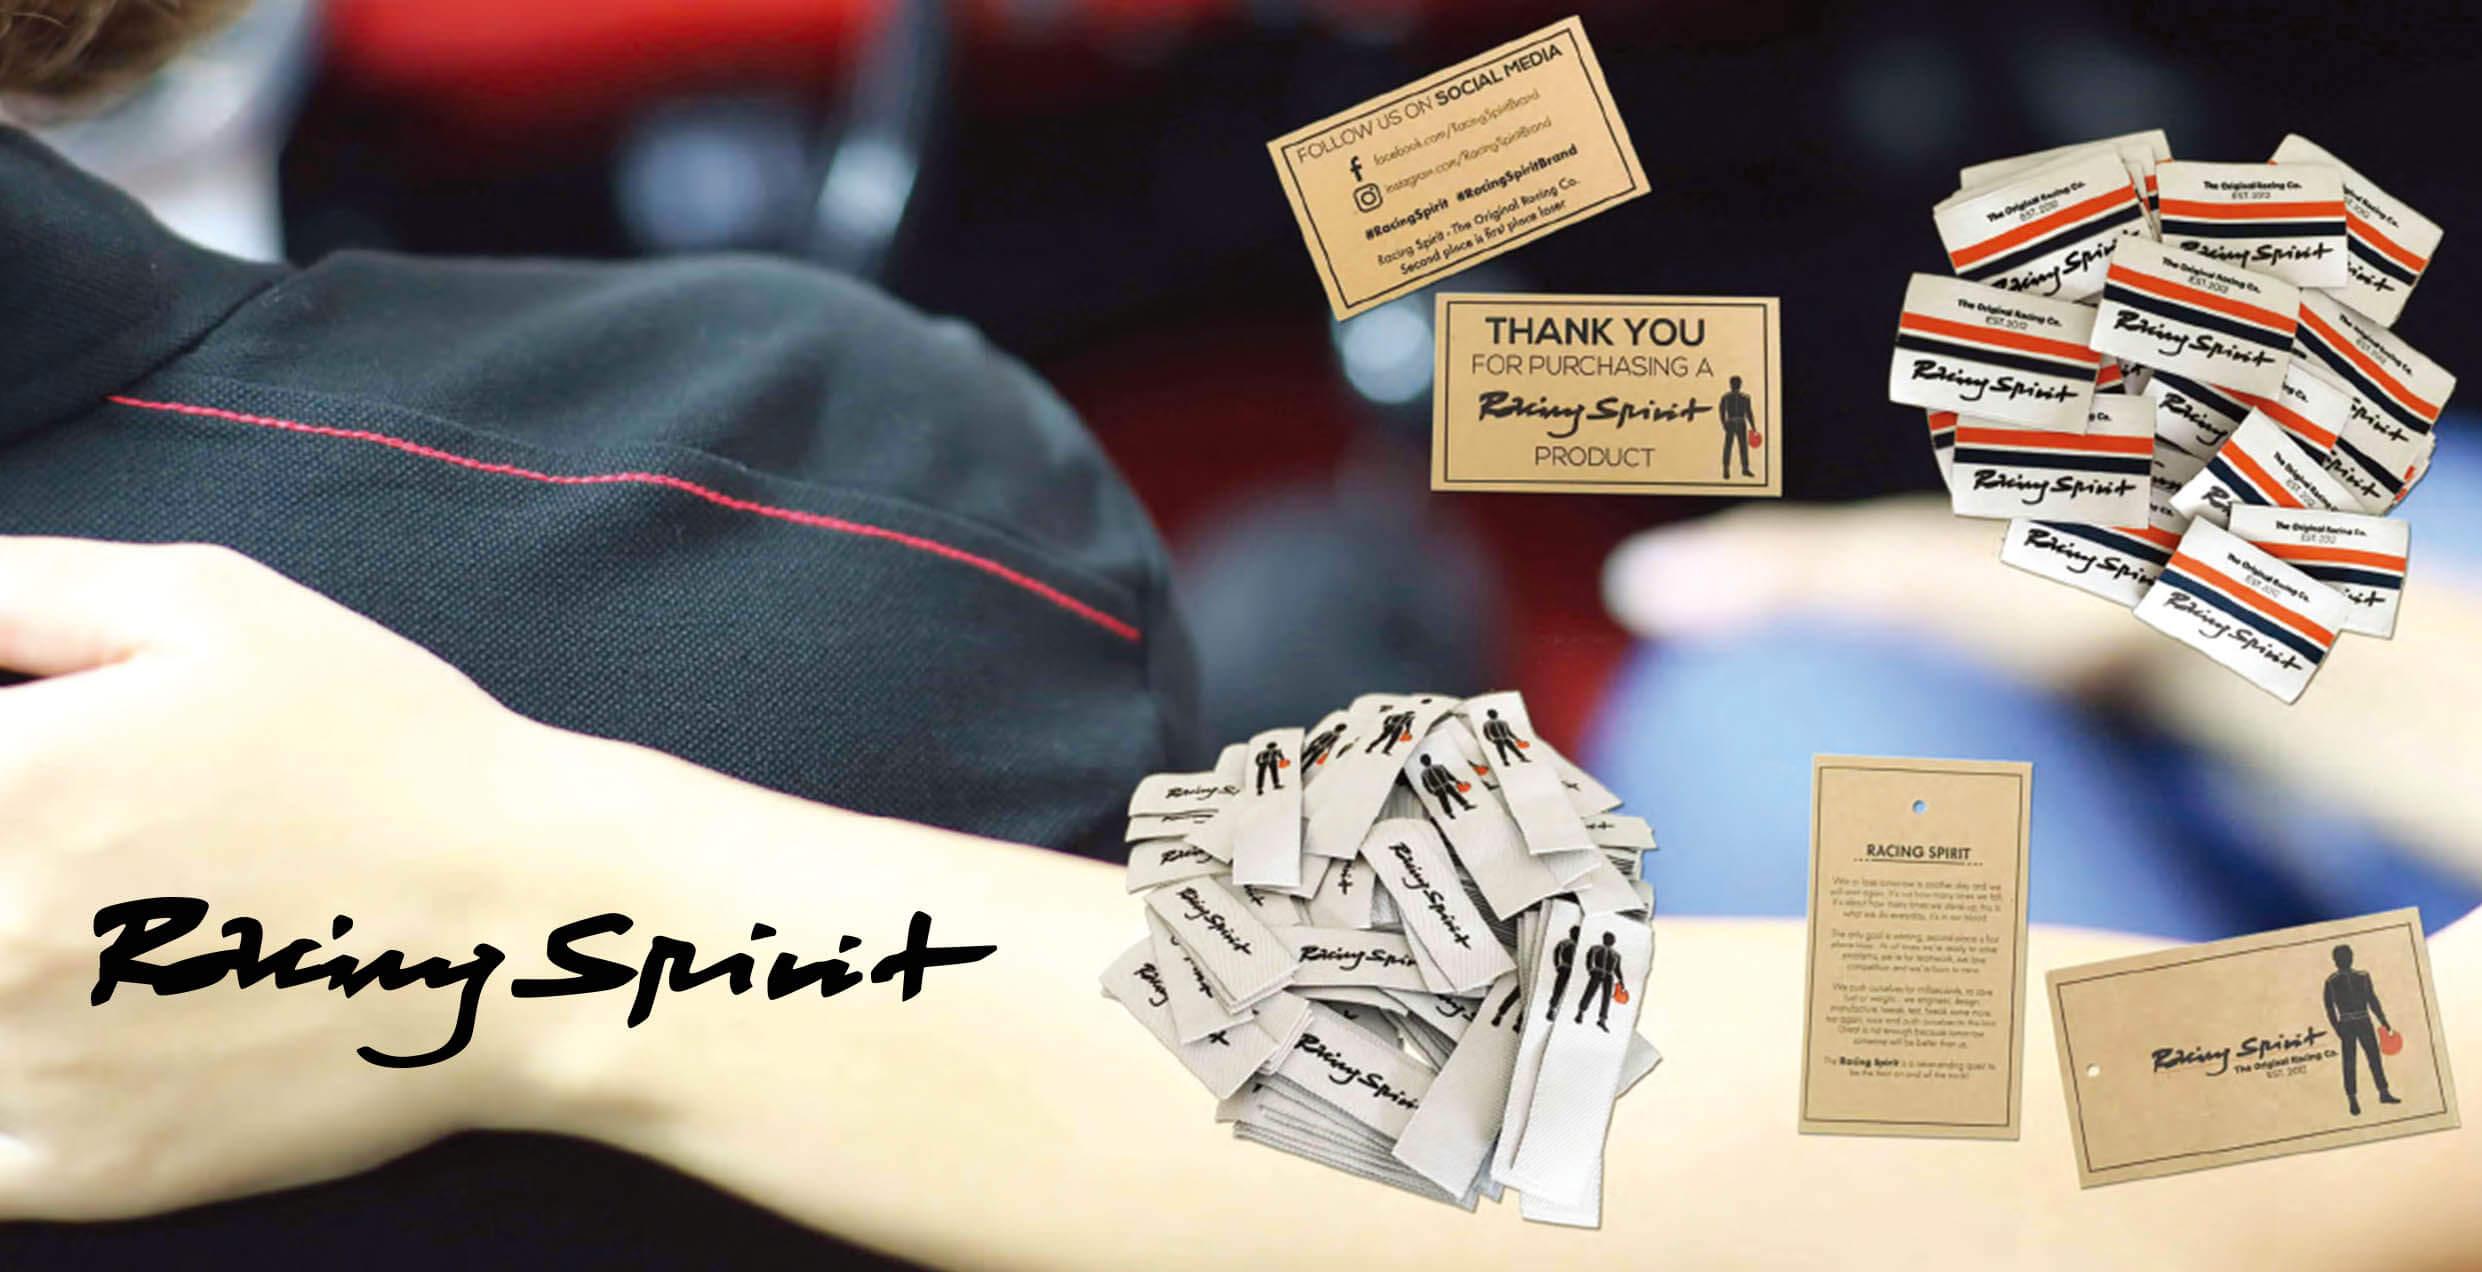 Racing Spirit